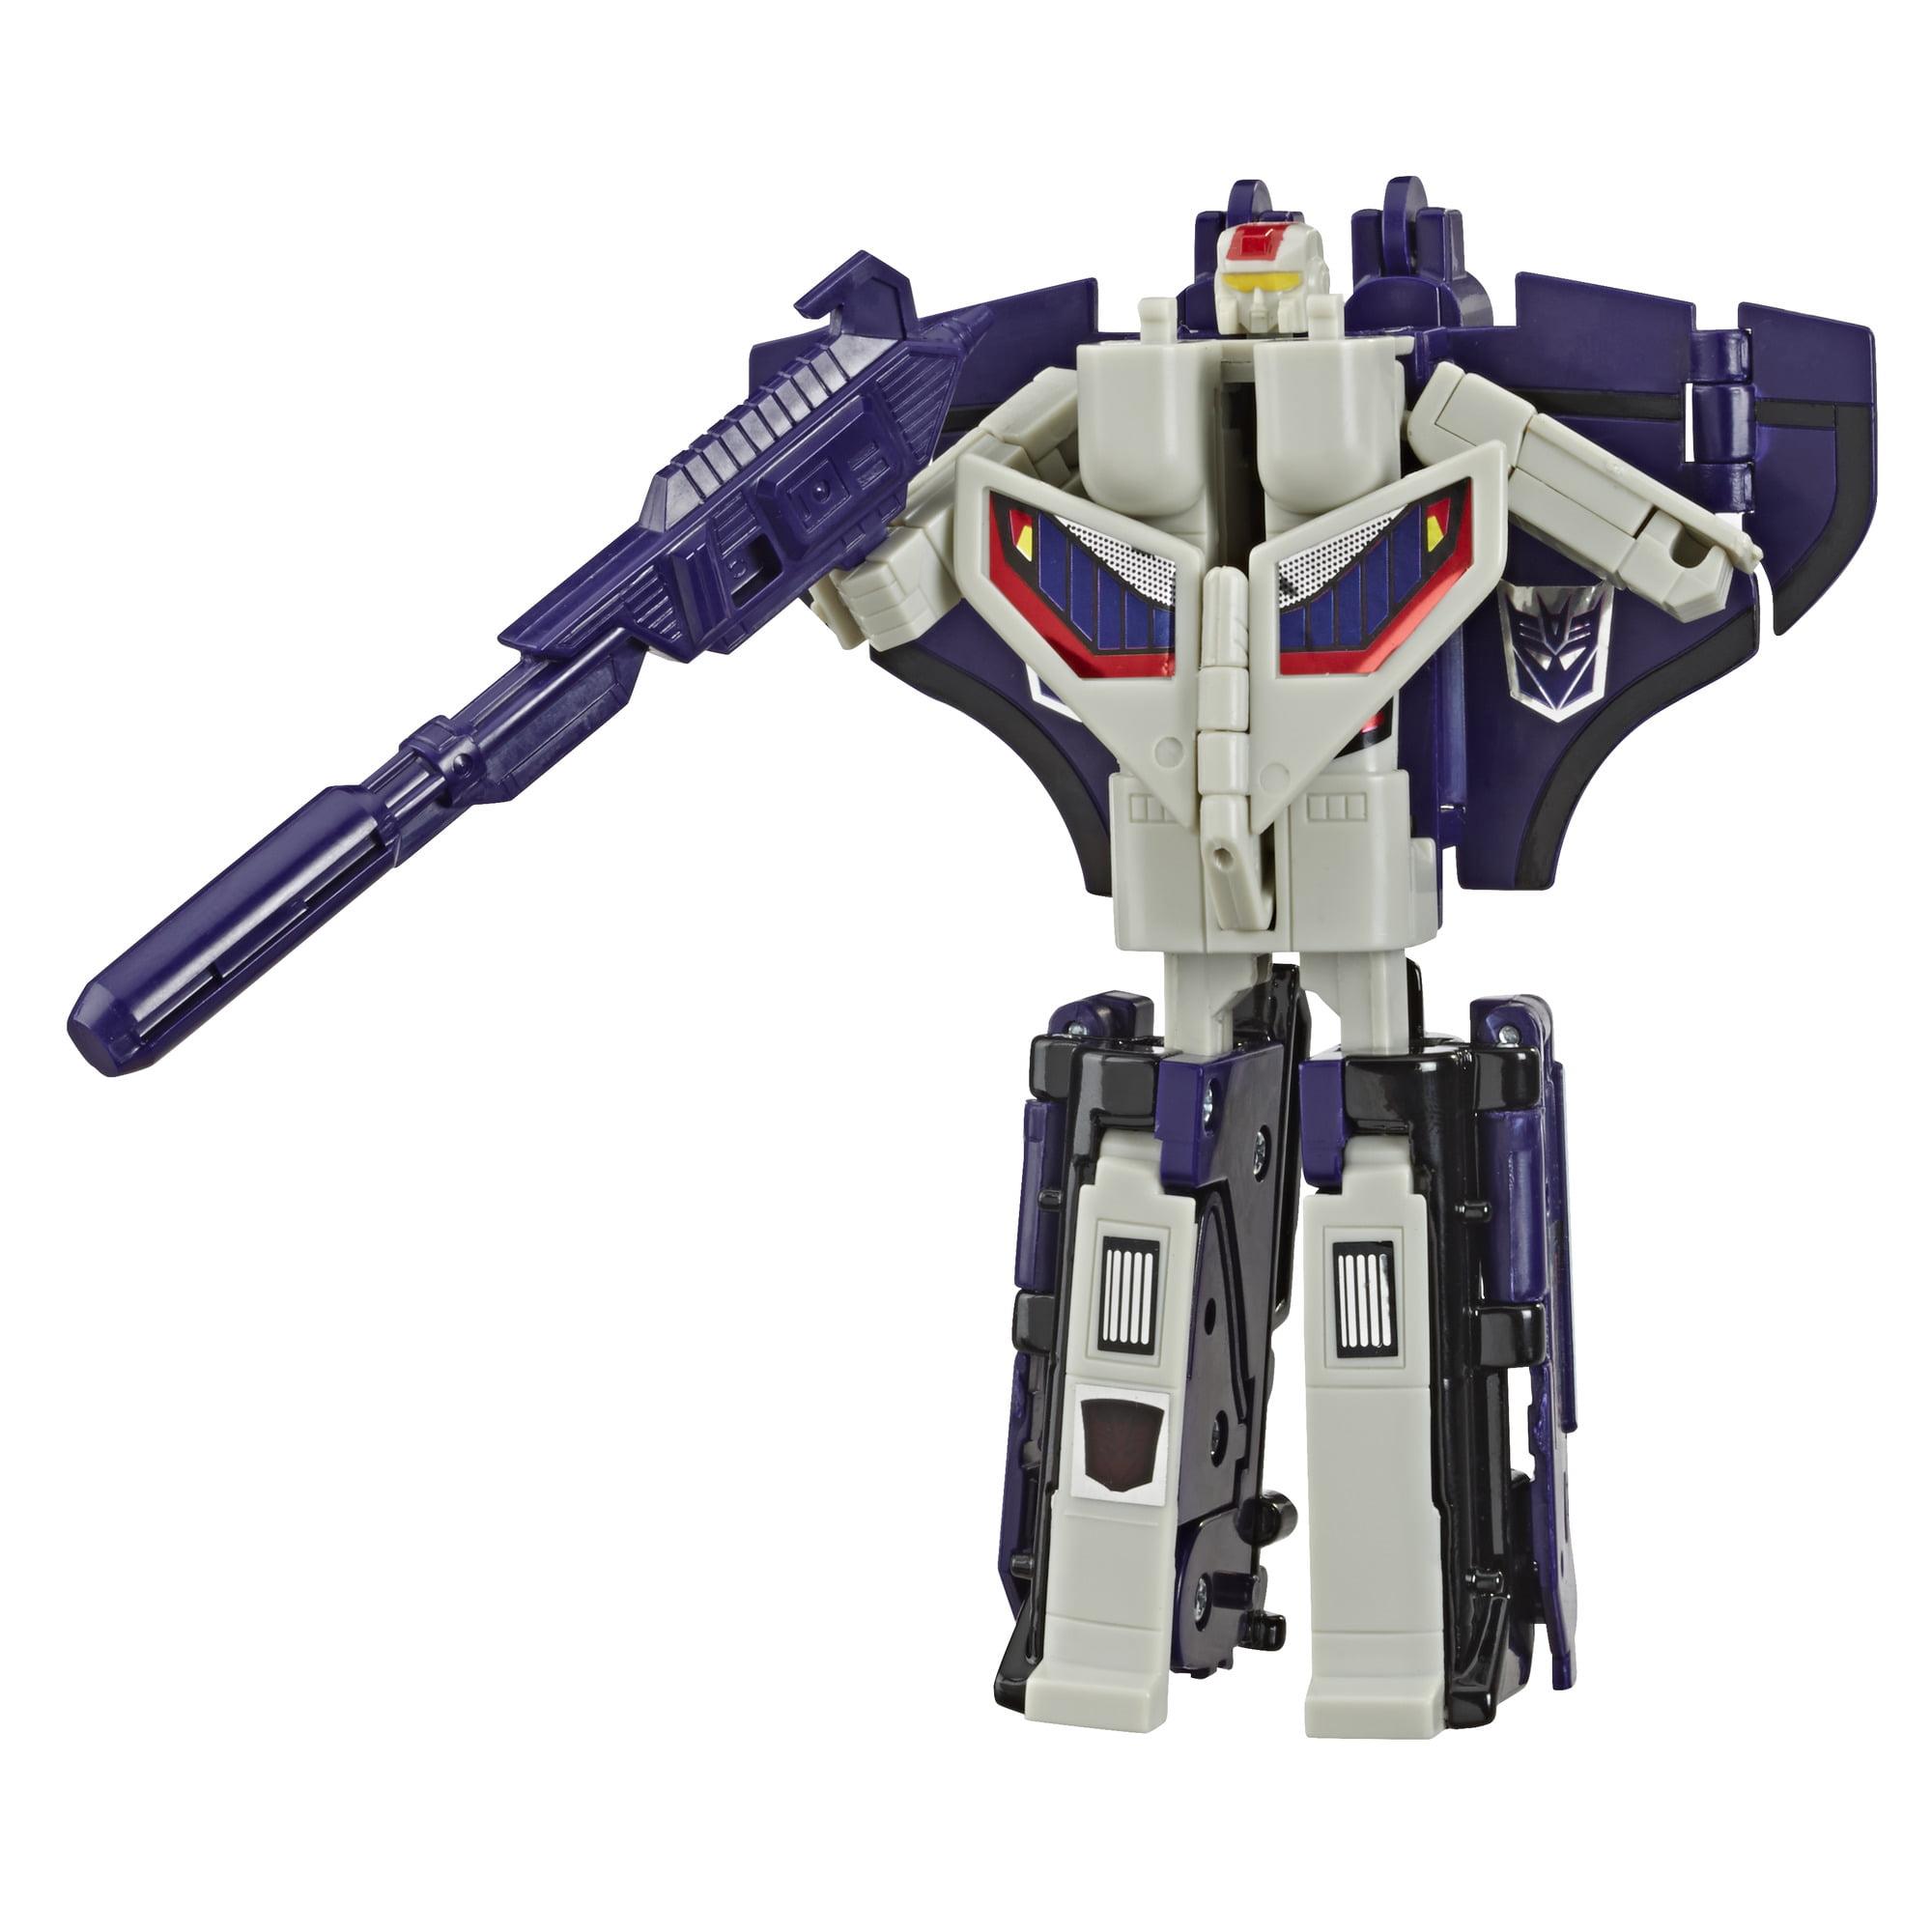 Transformers Toys Vintage G1 Astrotrain Action Figure